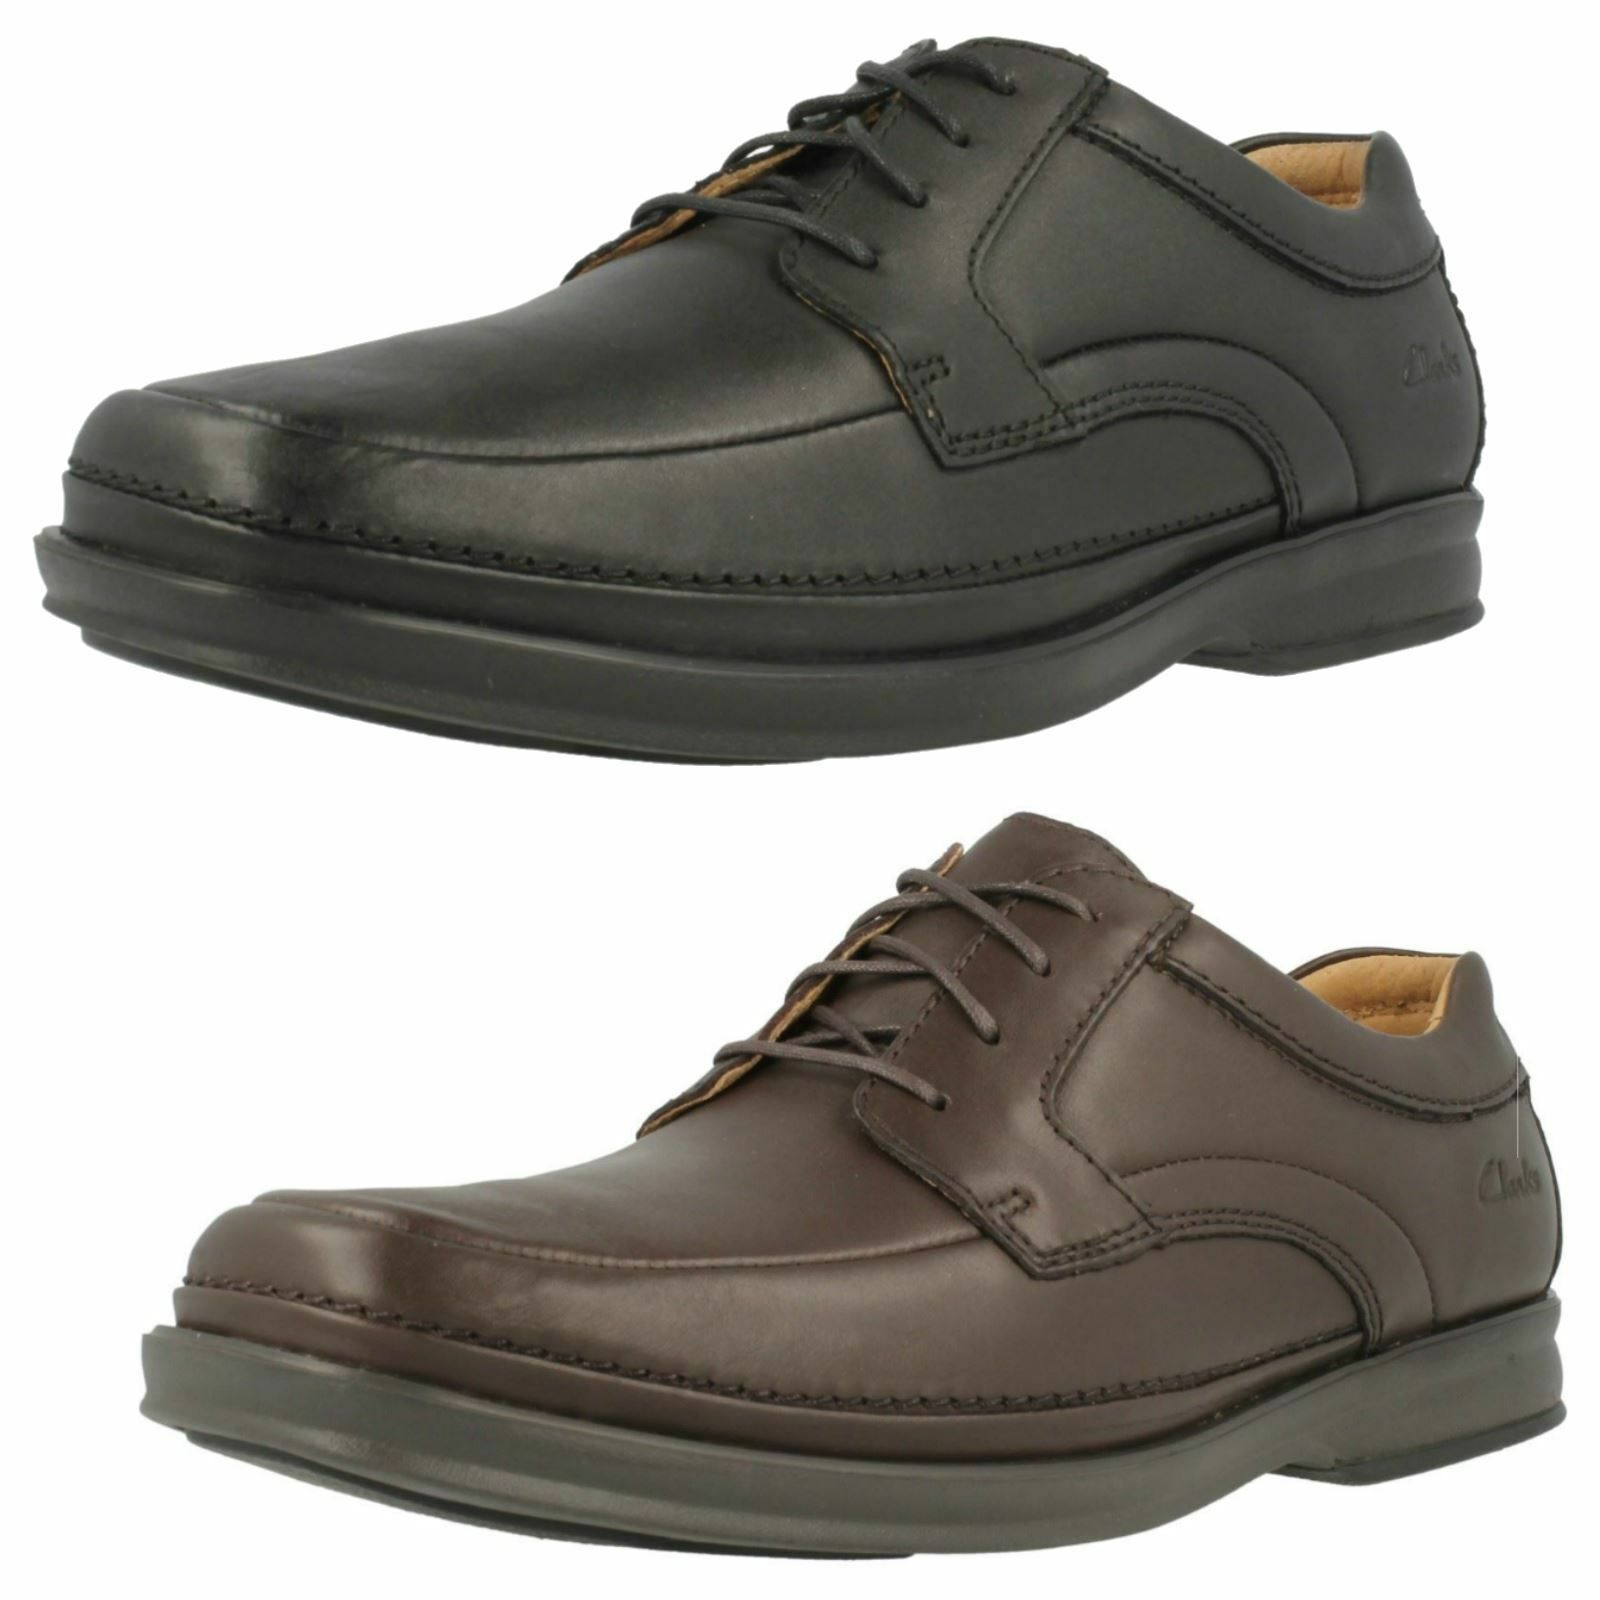 Uomo Clarks Smart Scopic Lace Up Schuhes - Scopic Smart Way 878e8e